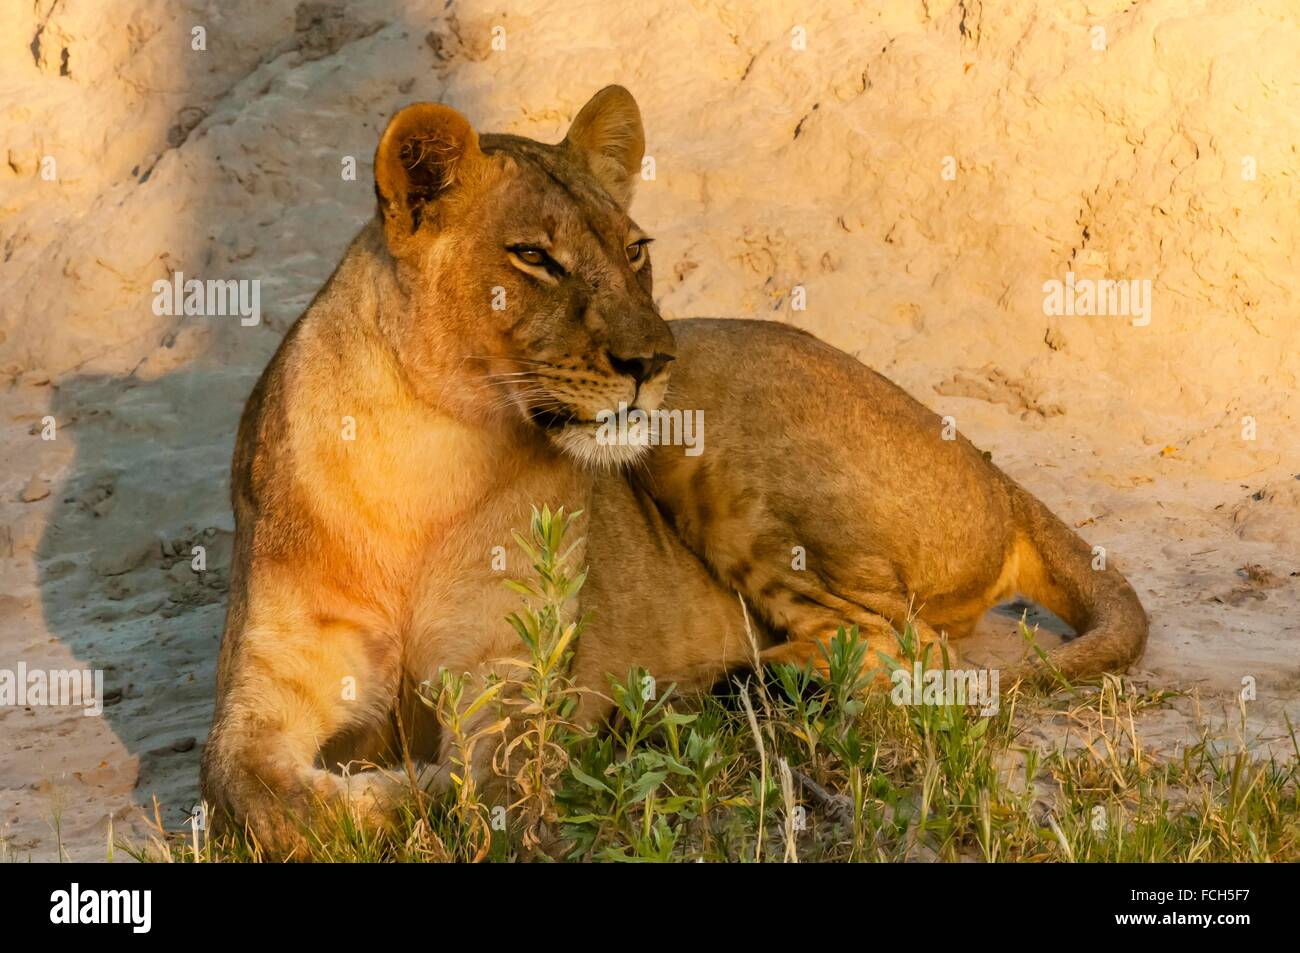 Lioness, Kwando Concession, Linyanti Marshes, Botswana. Stock Photo